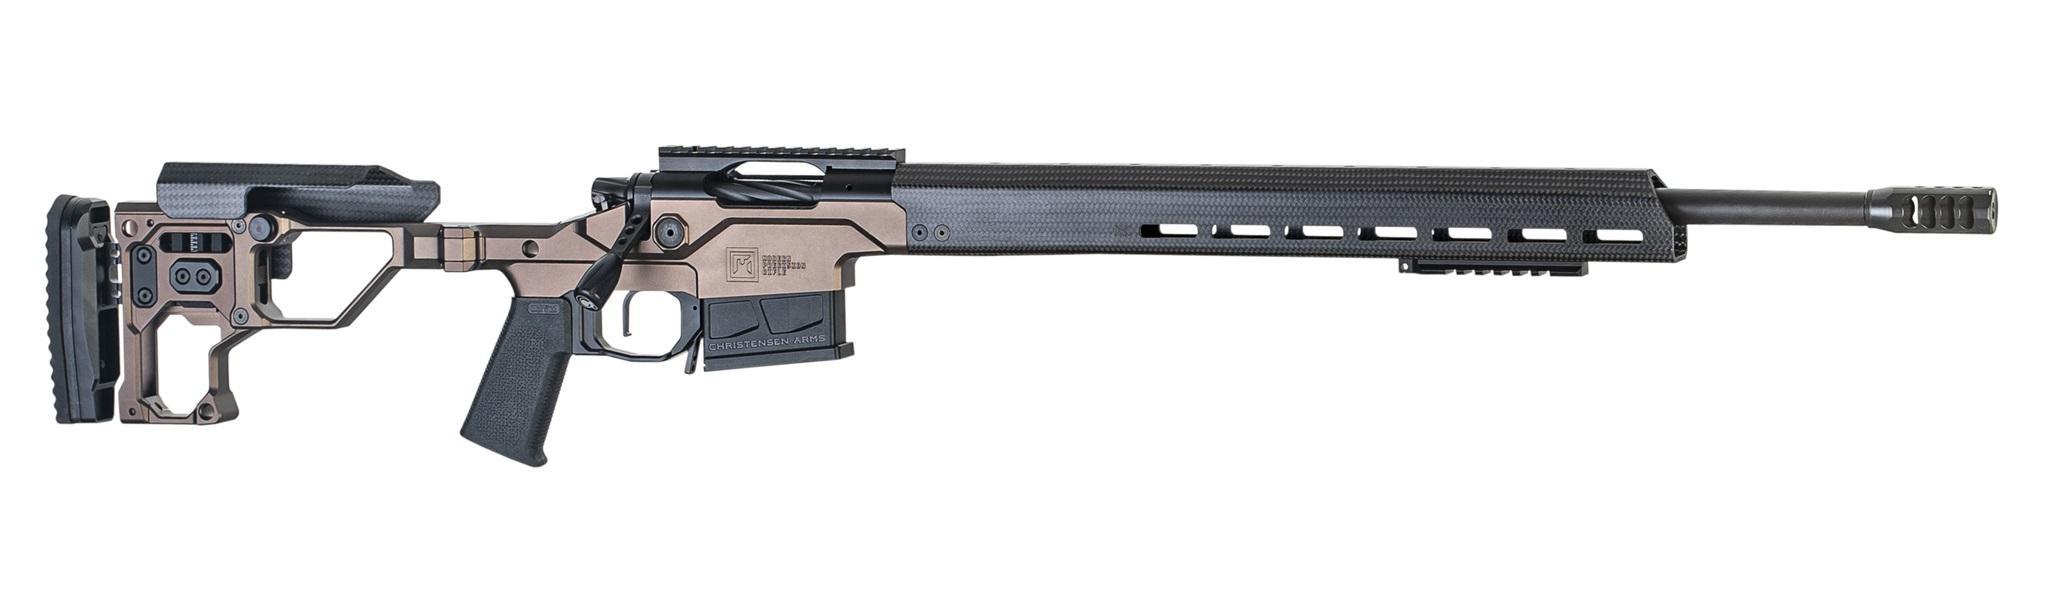 MPR STEEL 300PRC BROWN 26 - 801-03032-00